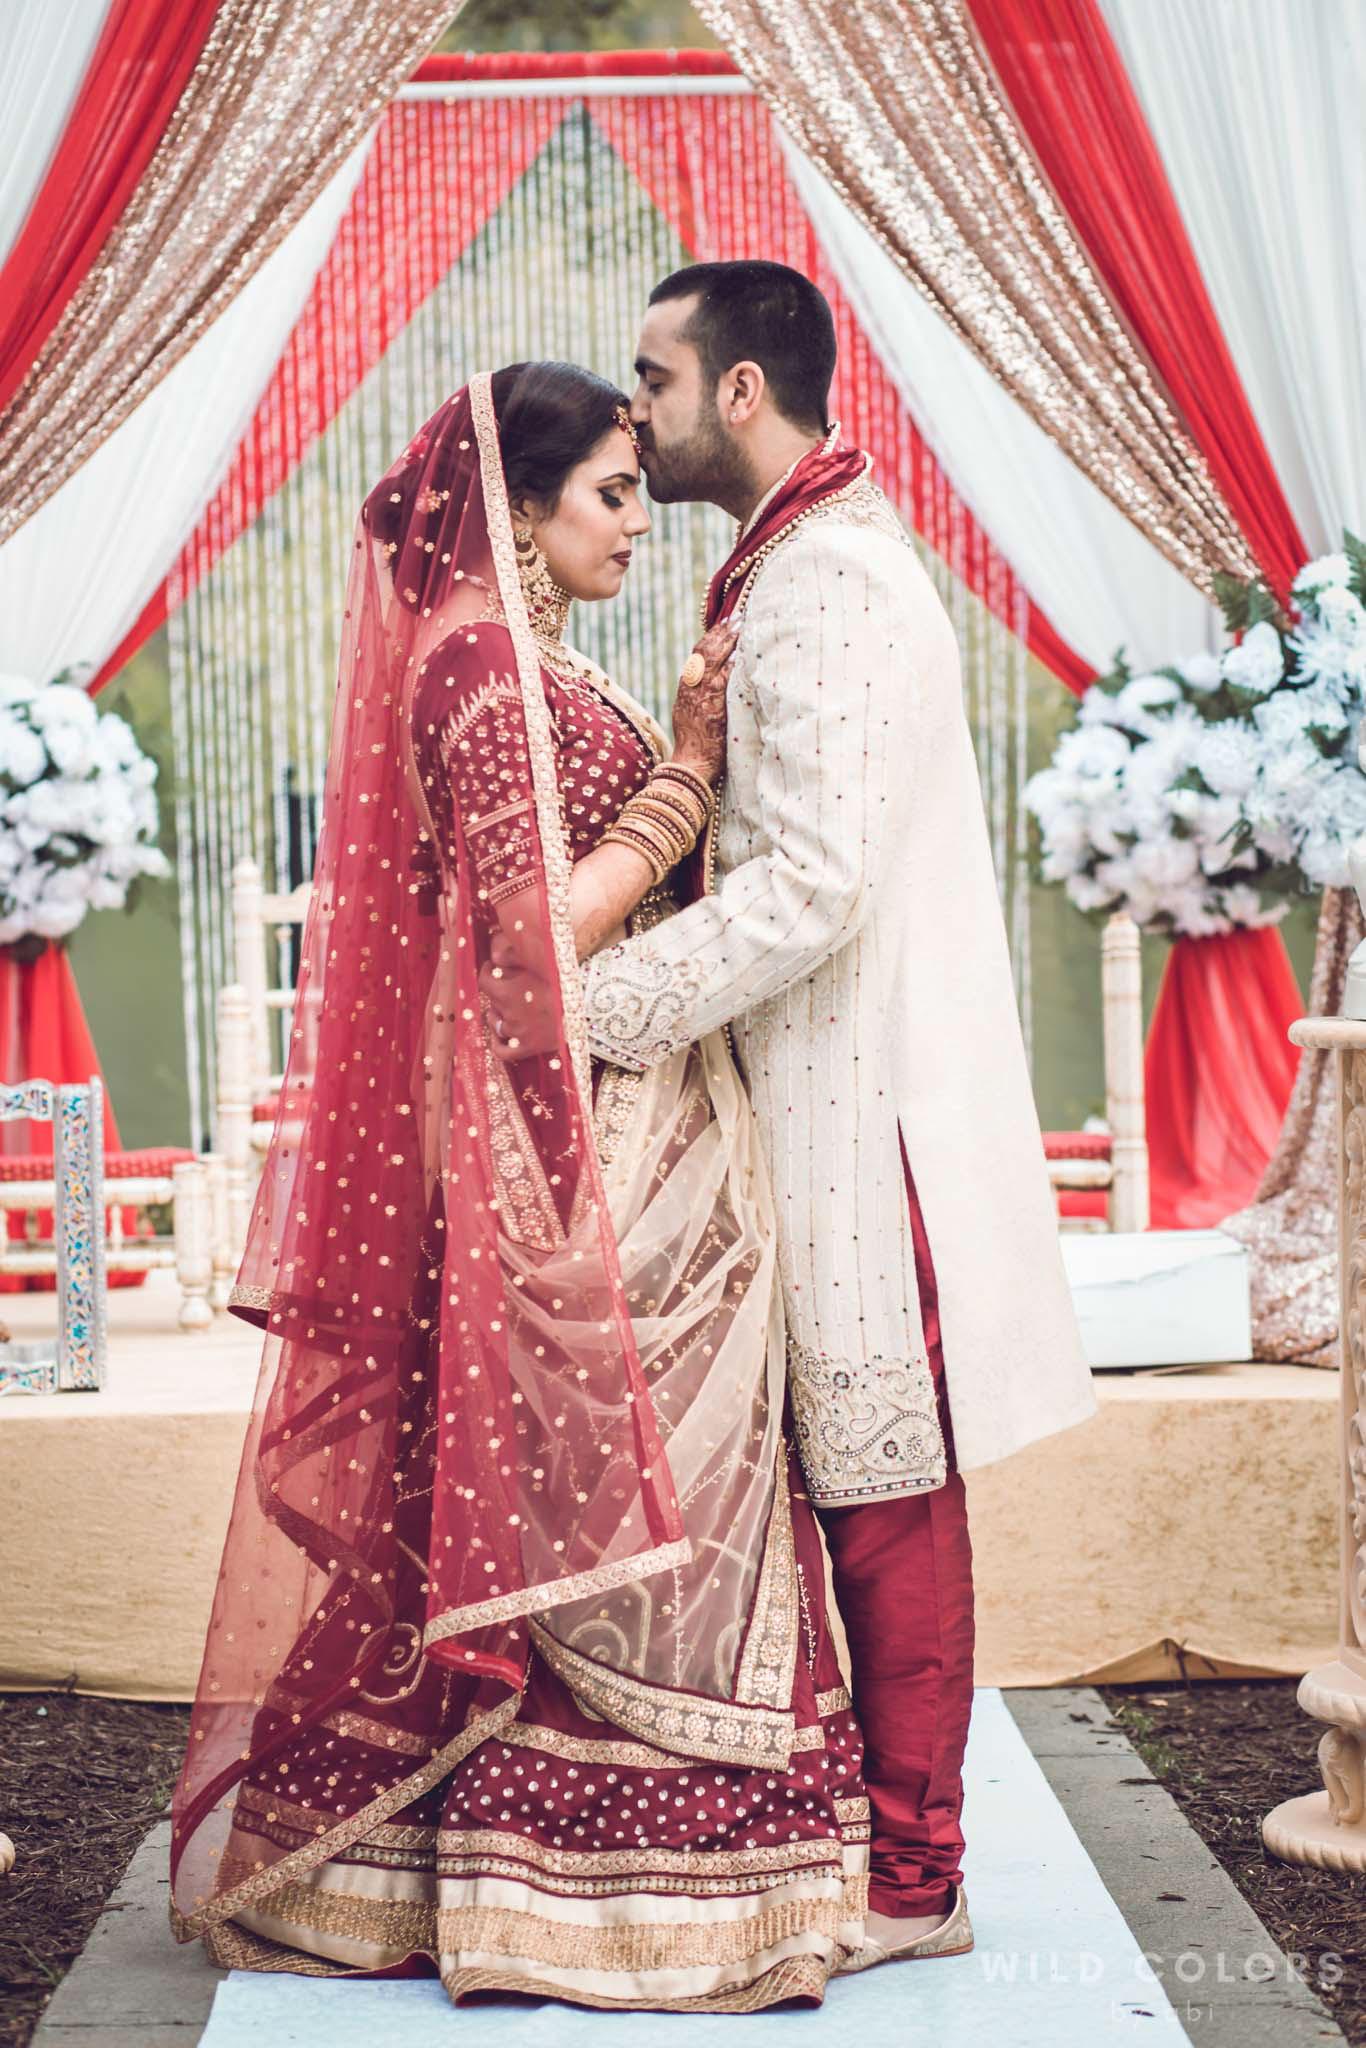 CANDID_INDIAN_WEDDING_ATLANTA_PHOTOGRAPHER-28.JPG